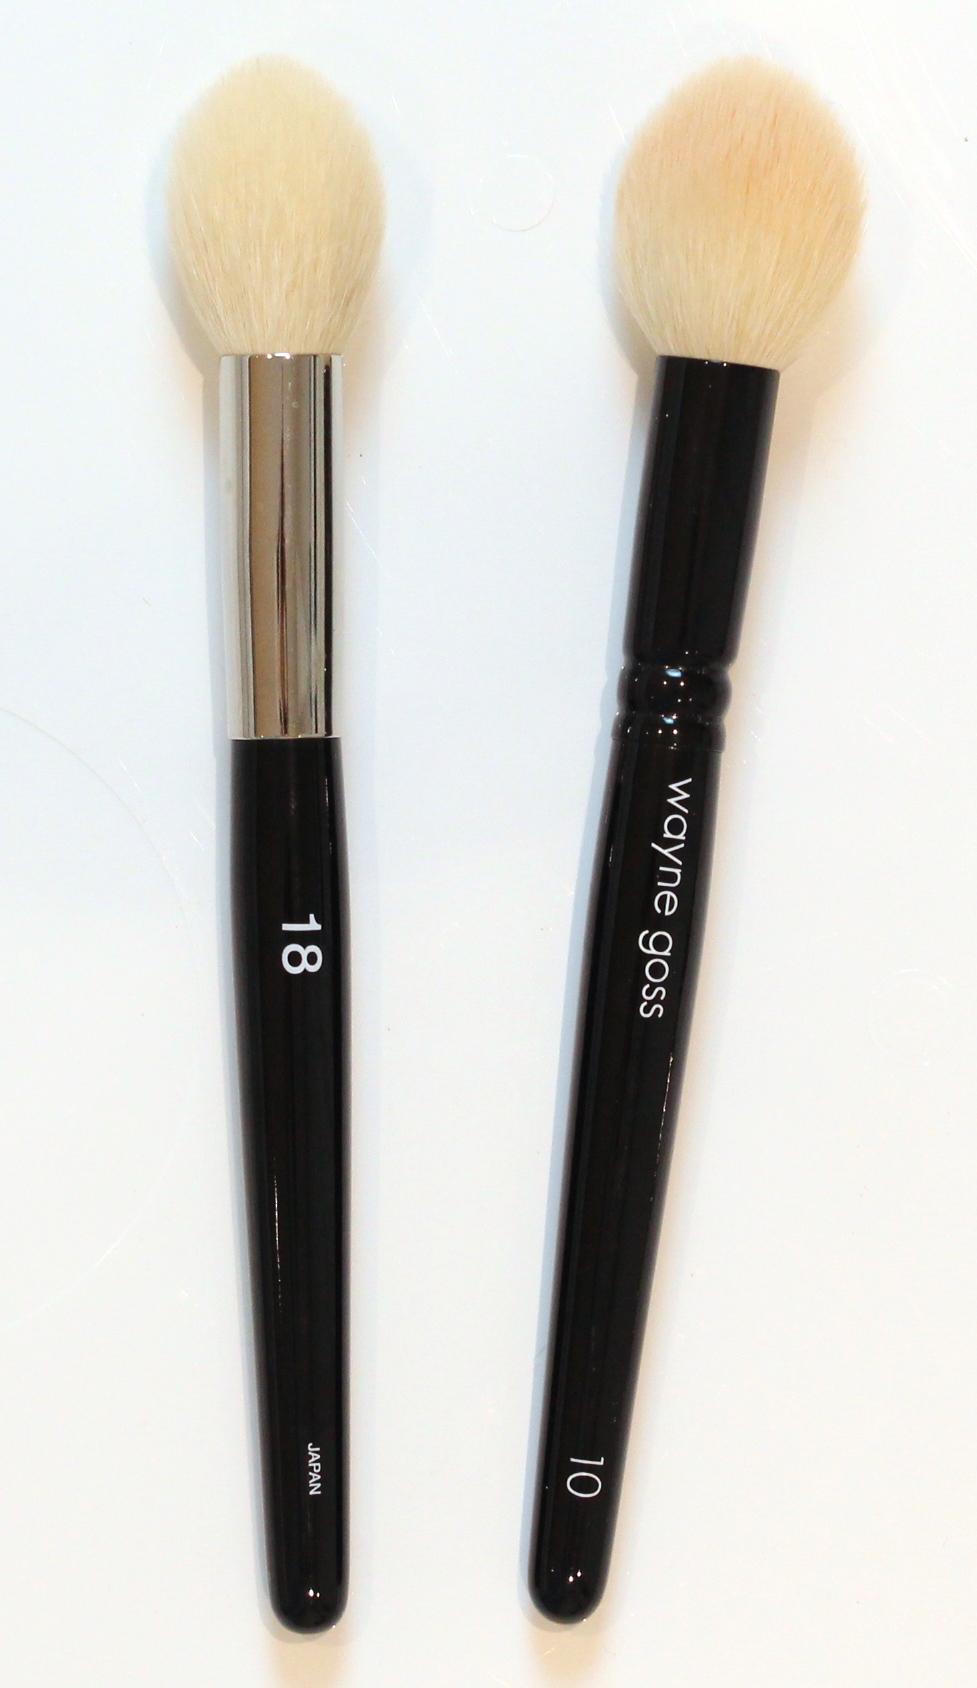 Rephr Brush 18 vs Wayne Goss 10 Brush